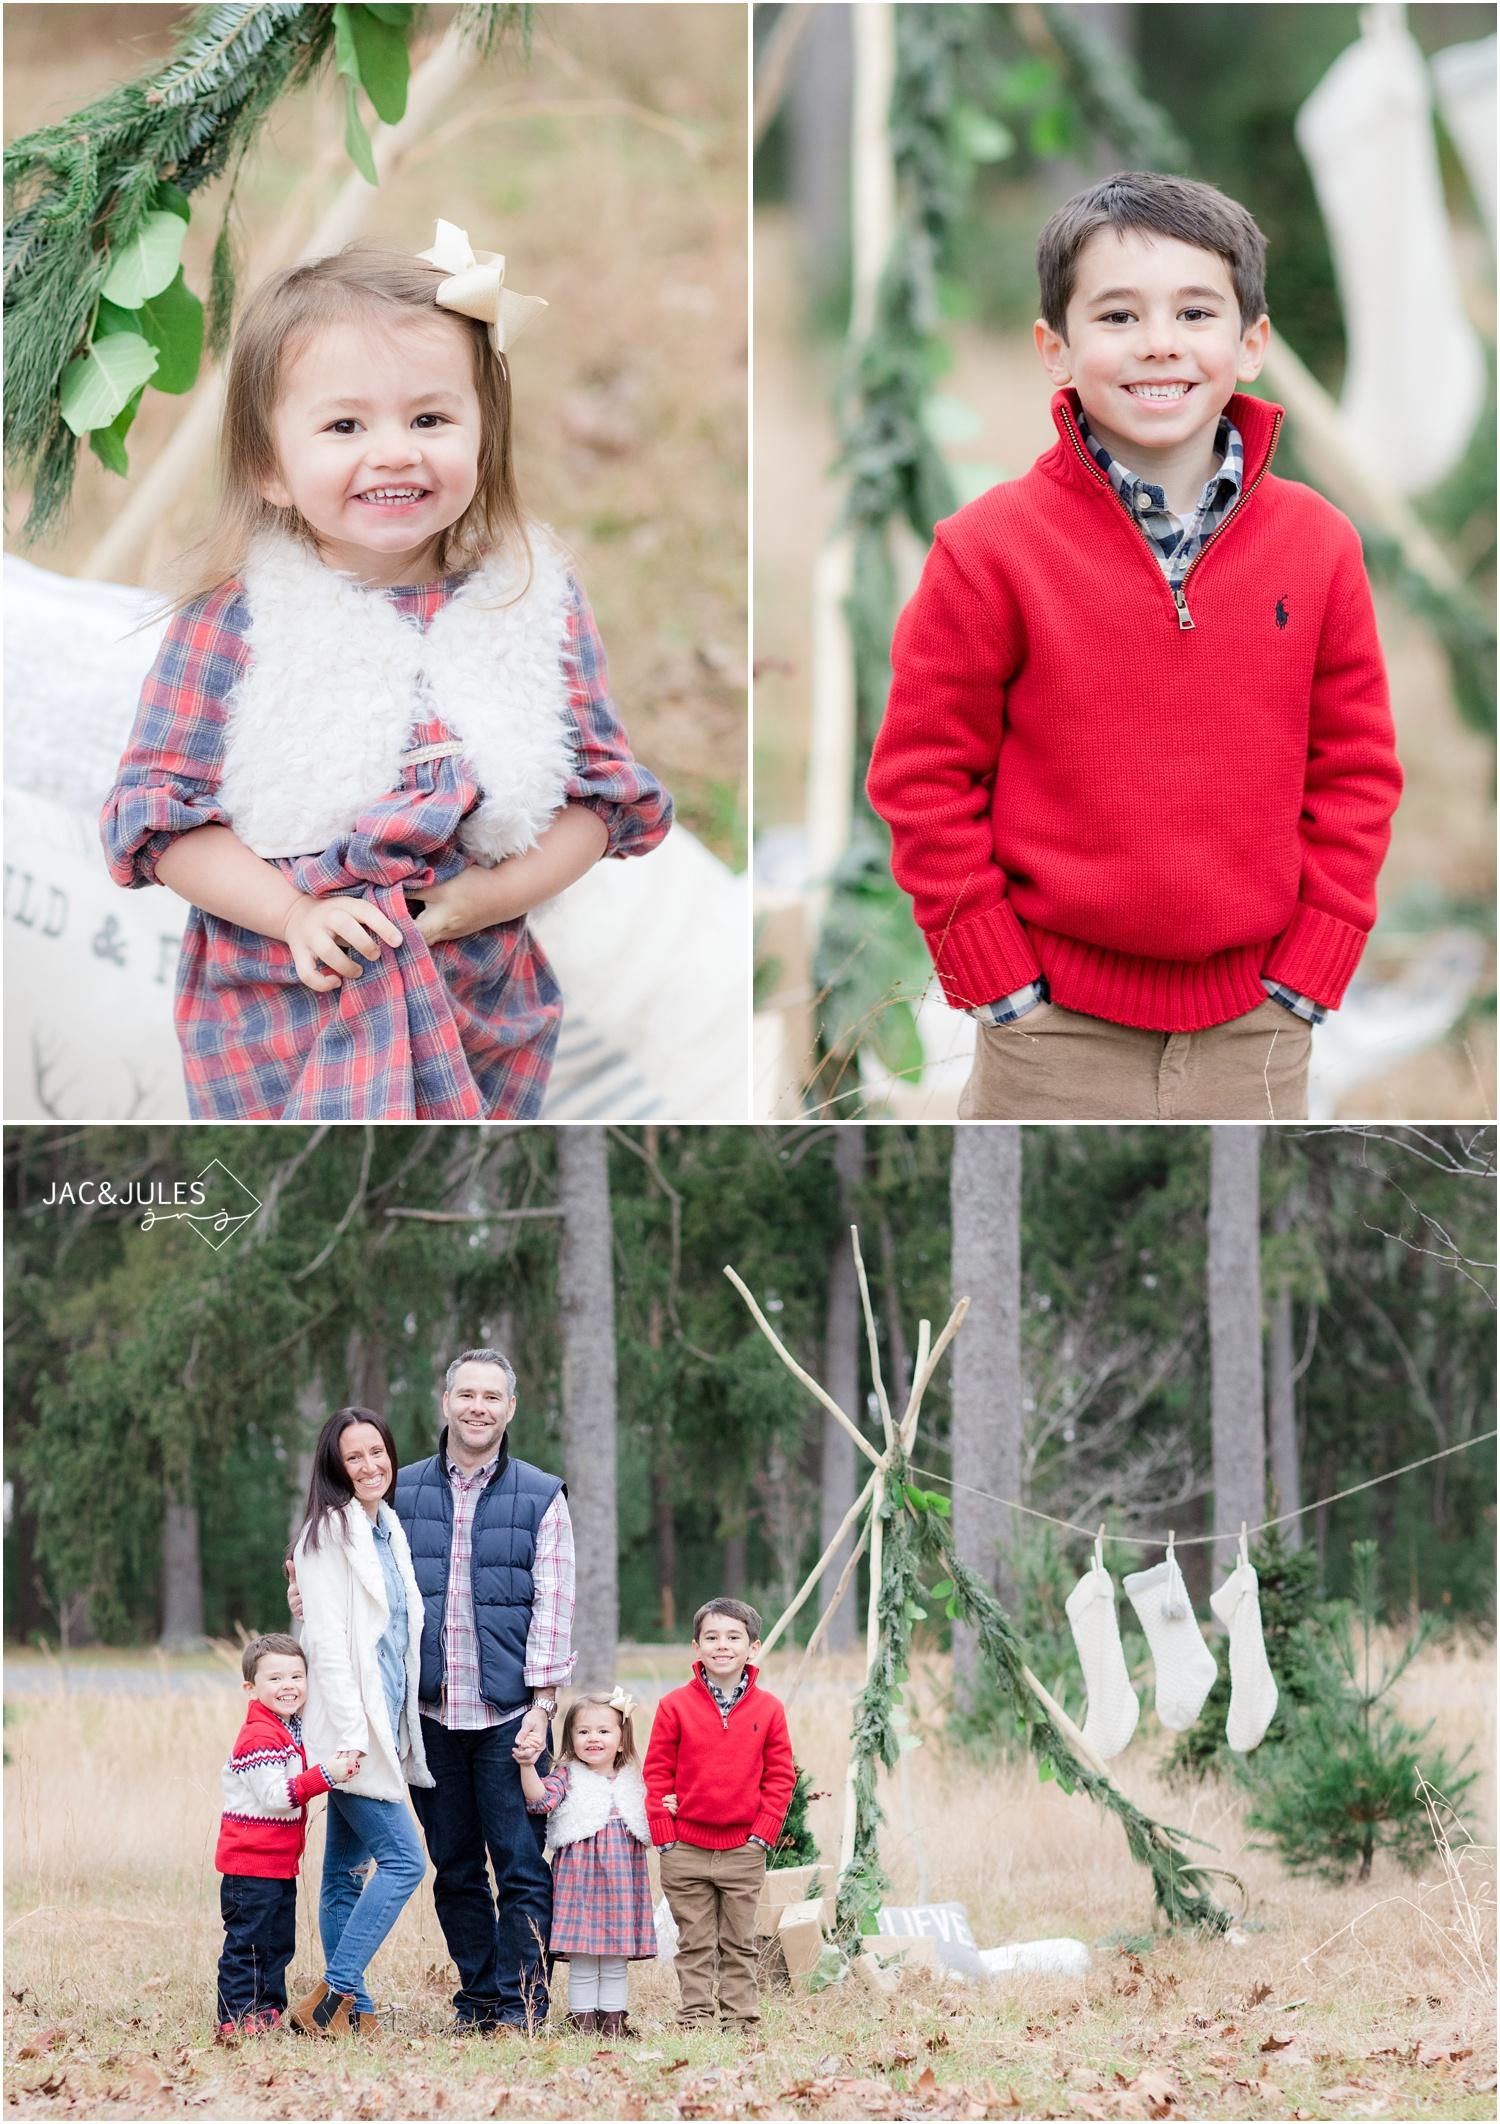 Family Christmas photos in Ocean County Park in NJ.